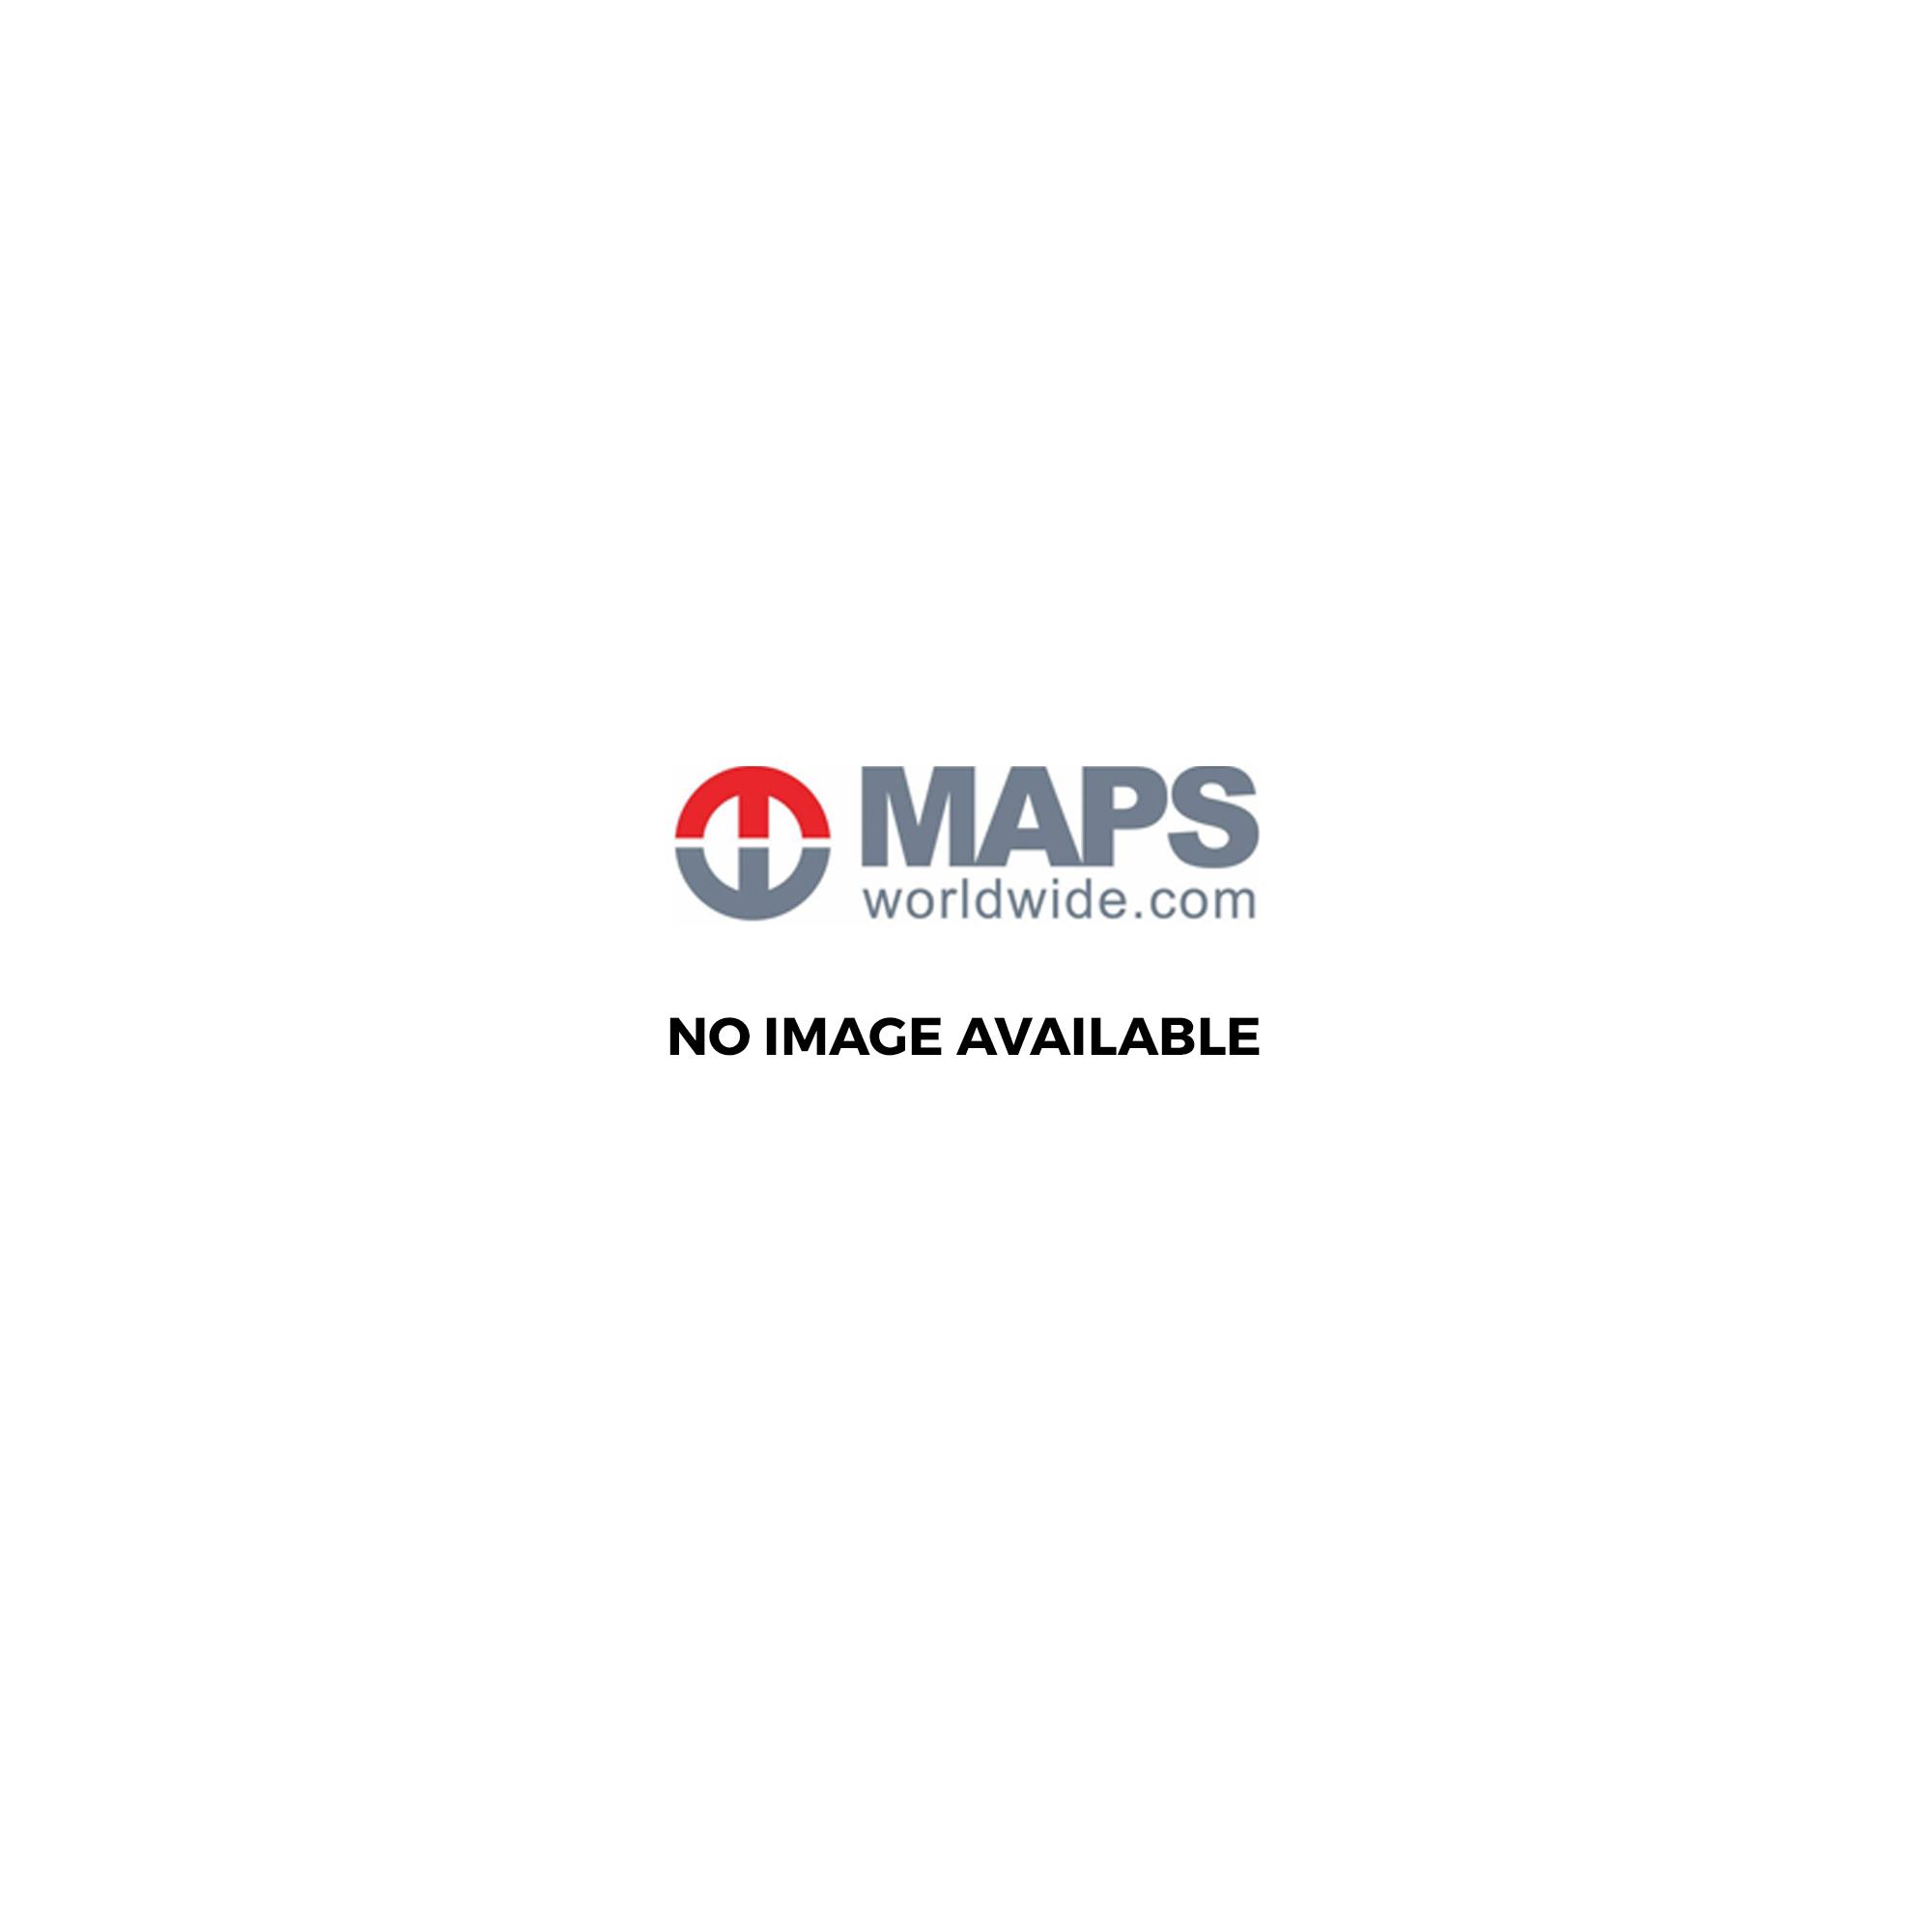 OLD ORDNANCE  SURVEY MAP SHREWSBURY NORTH SHROPSHIRE 1900 Sheet 34.07 New